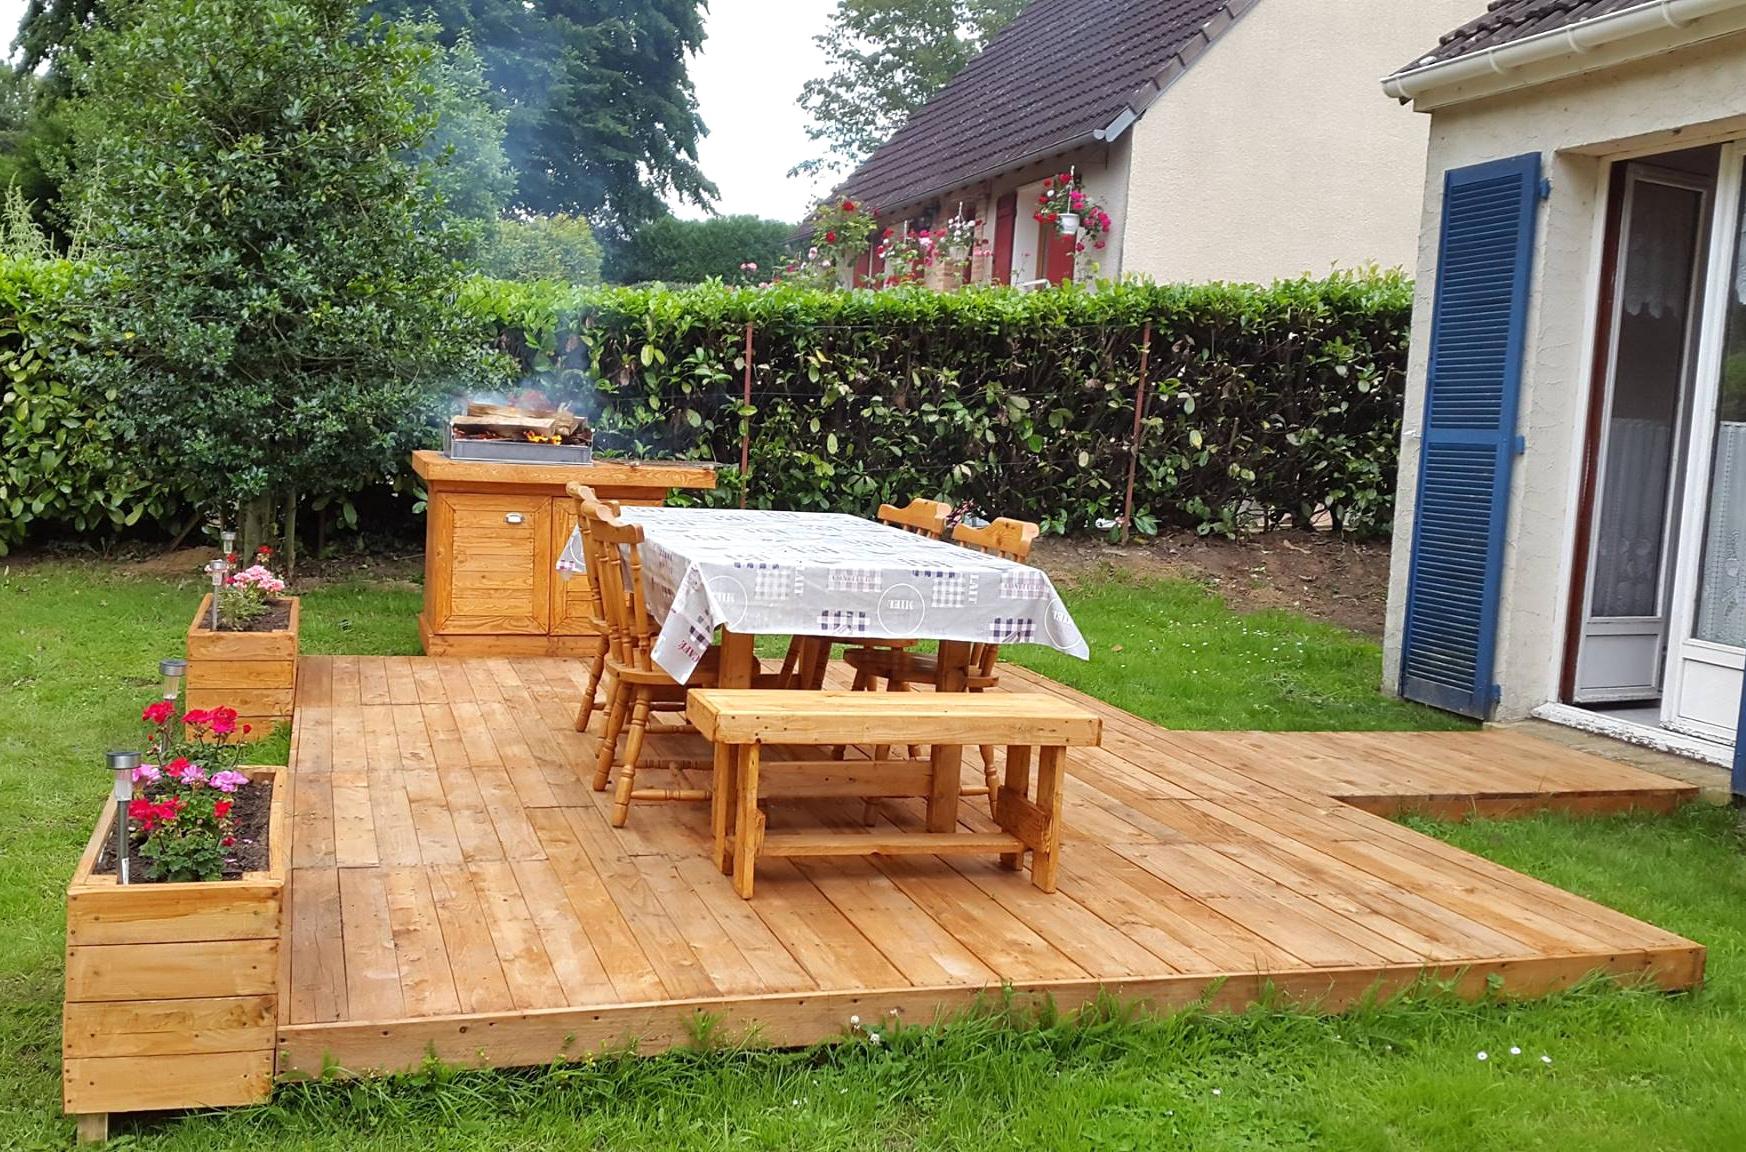 BBQ Feasting Deck Made of Pallets - DIY on Diy Bbq Patio id=45786